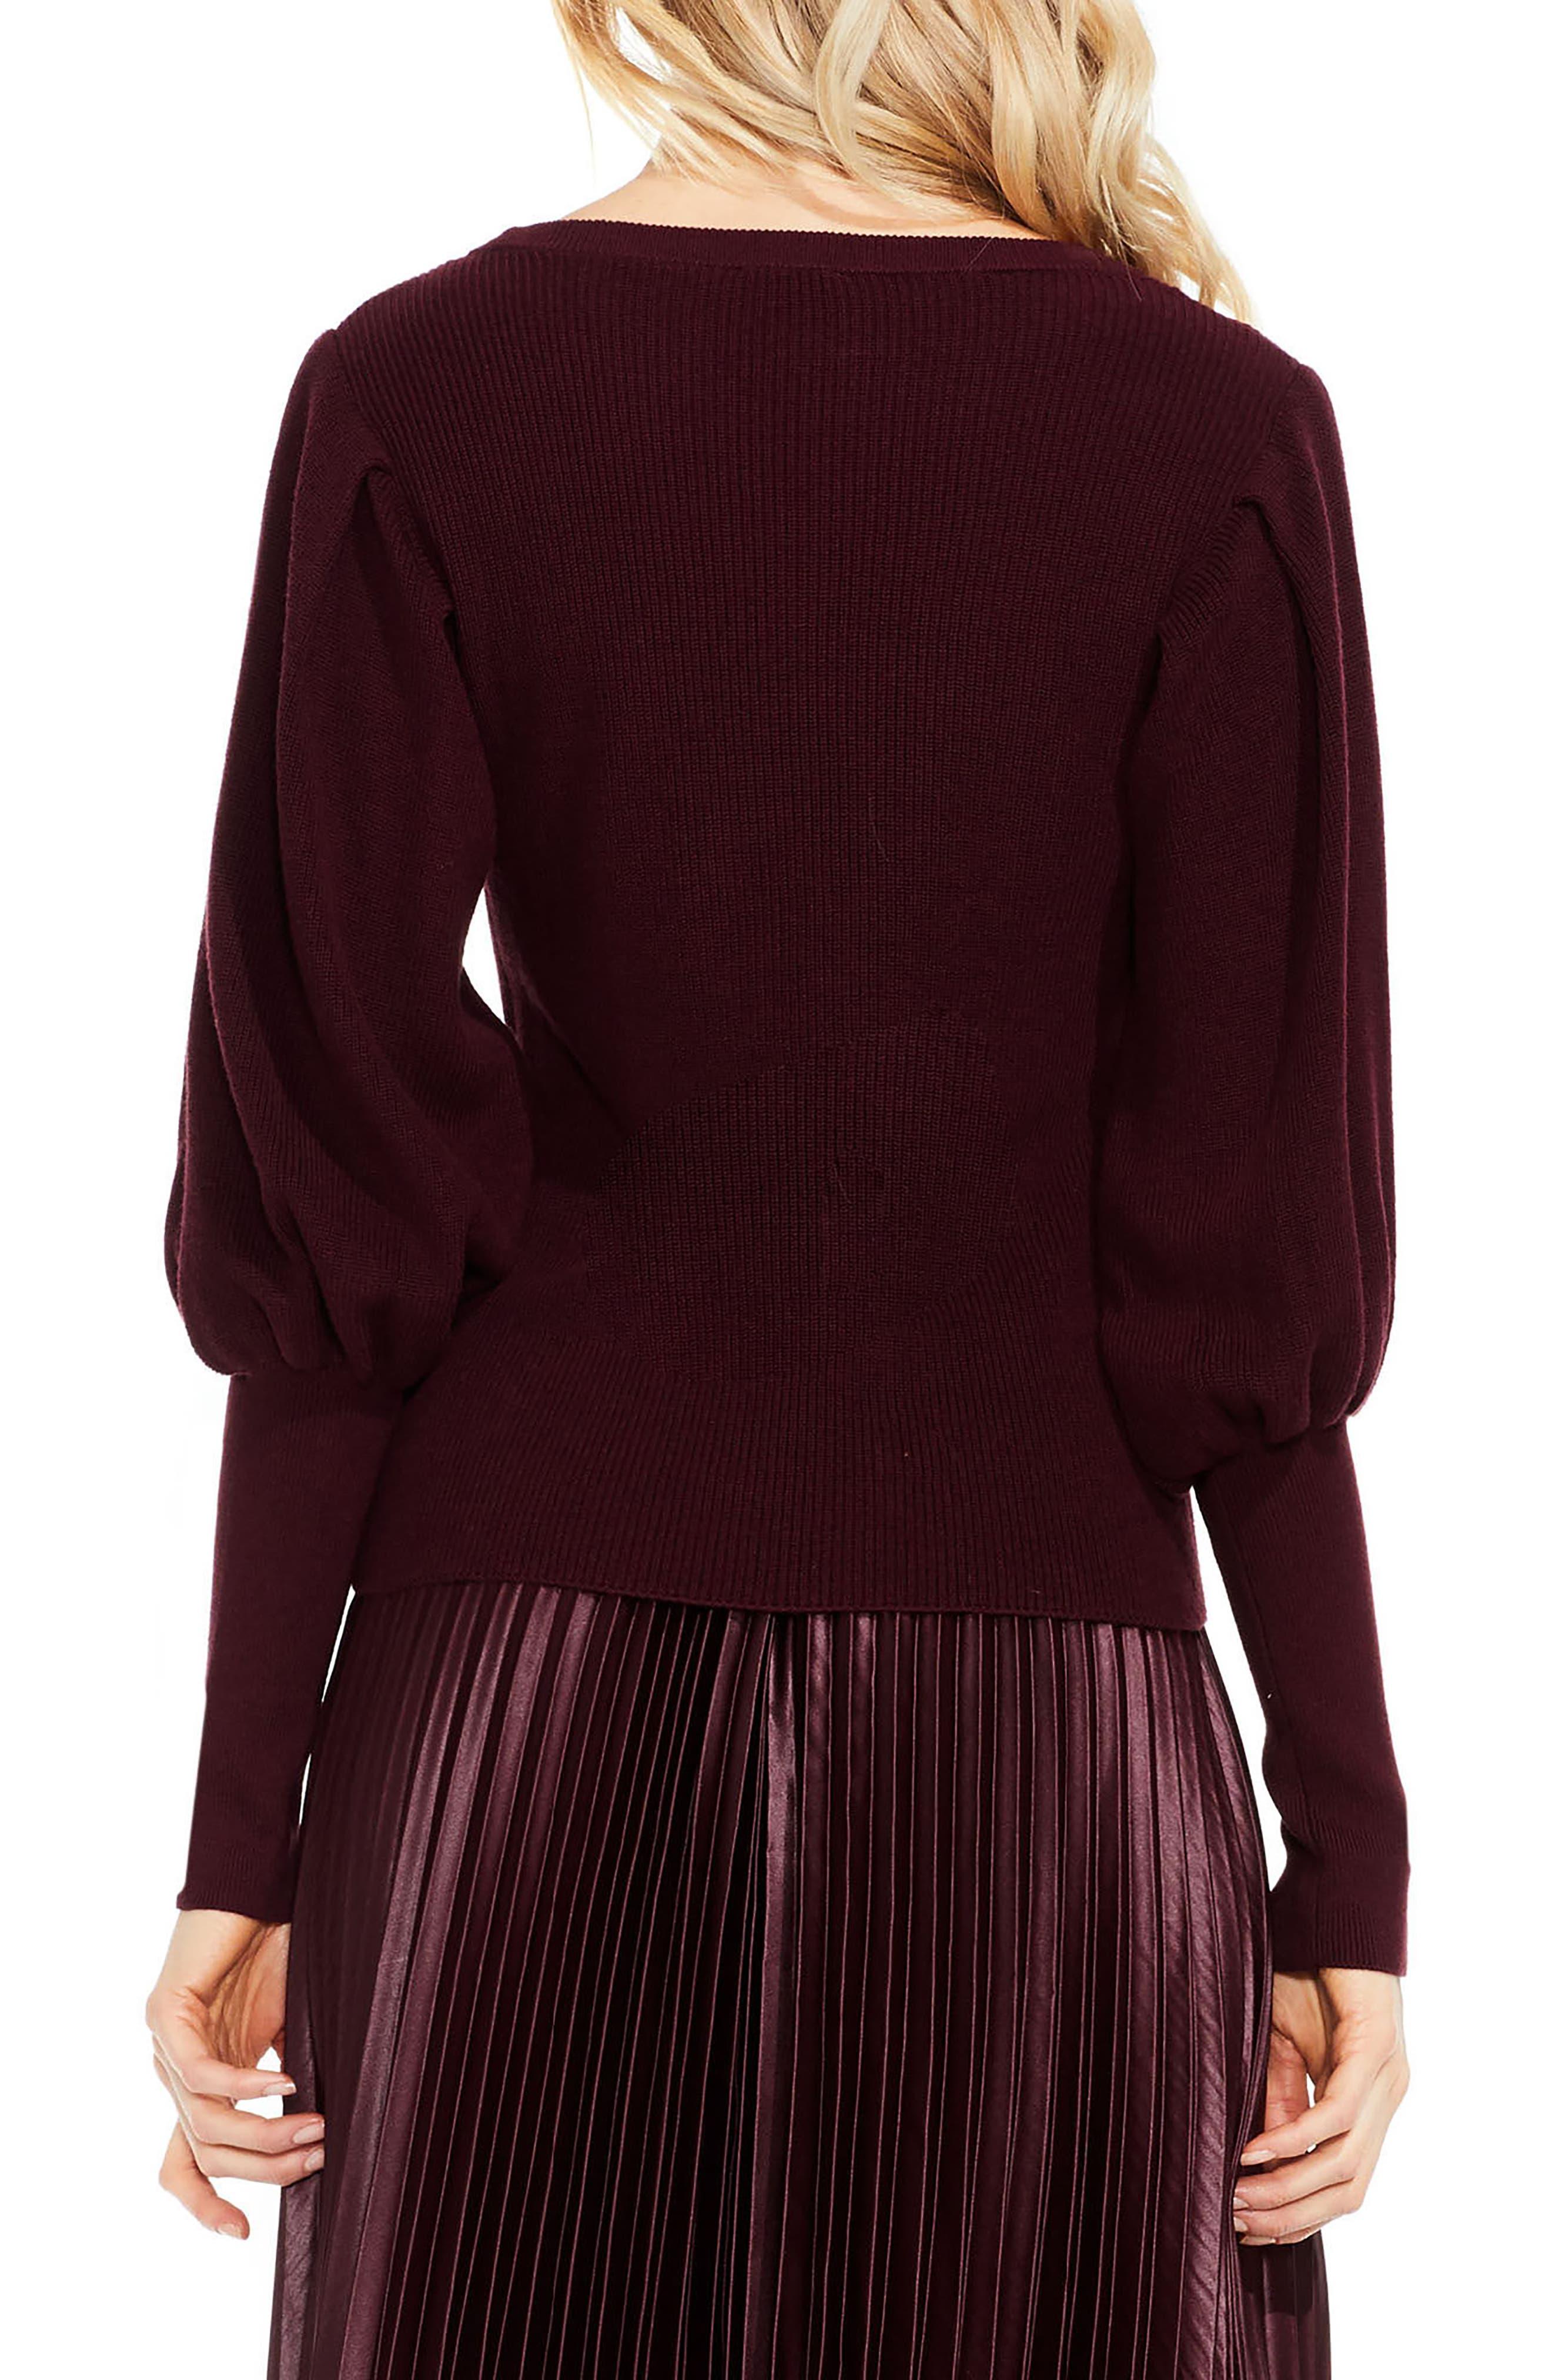 Alternate Image 3  - Vince Camuto Bubble Sleeve Sweater (Regular & Petite)